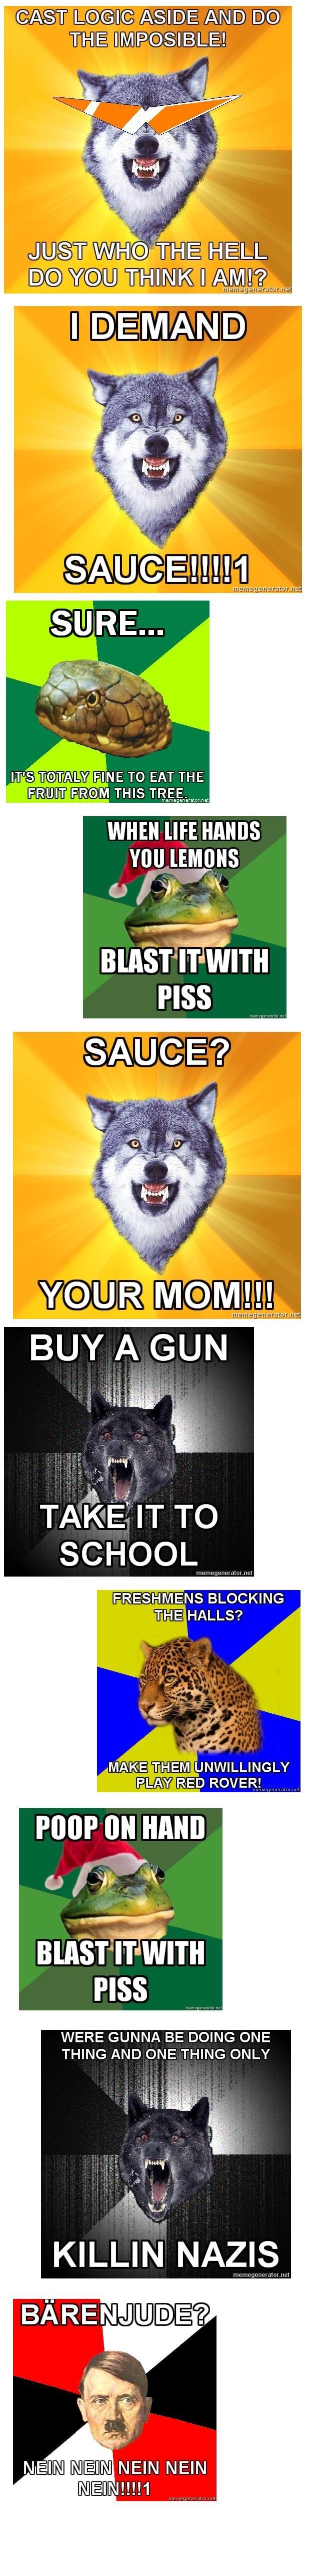 Epic Meme Collection. Some funny meme's I either made or found.. I A Dig. IT' S TOTAL NE TO EAT THE mom mus Mitm WHEN WE HANDS lfi TAKE IT w, FRESHMENS BLOCKING meme courage wol